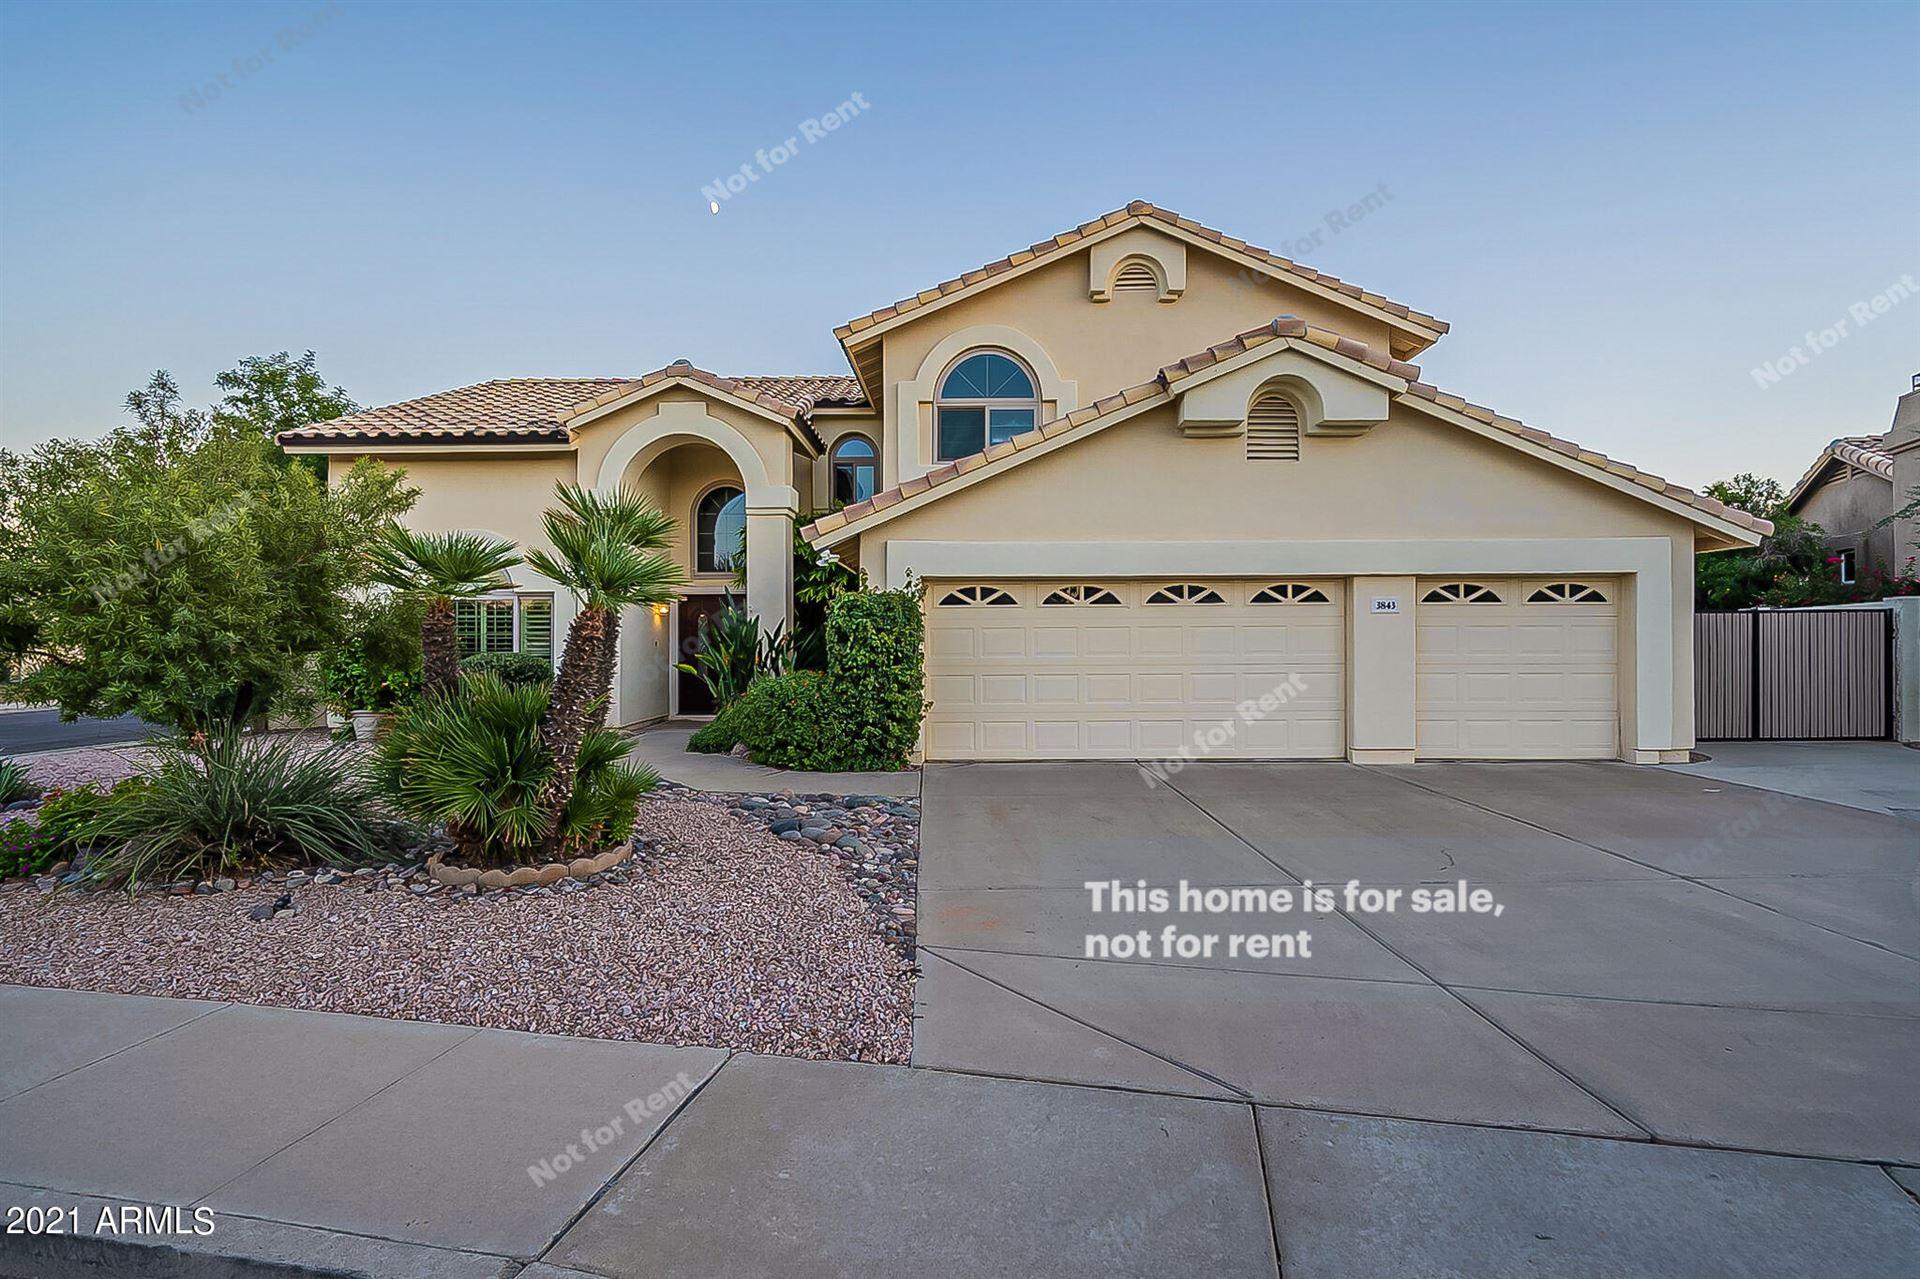 Photo of 3843 W IRONWOOD Drive, Chandler, AZ 85226 (MLS # 6307748)